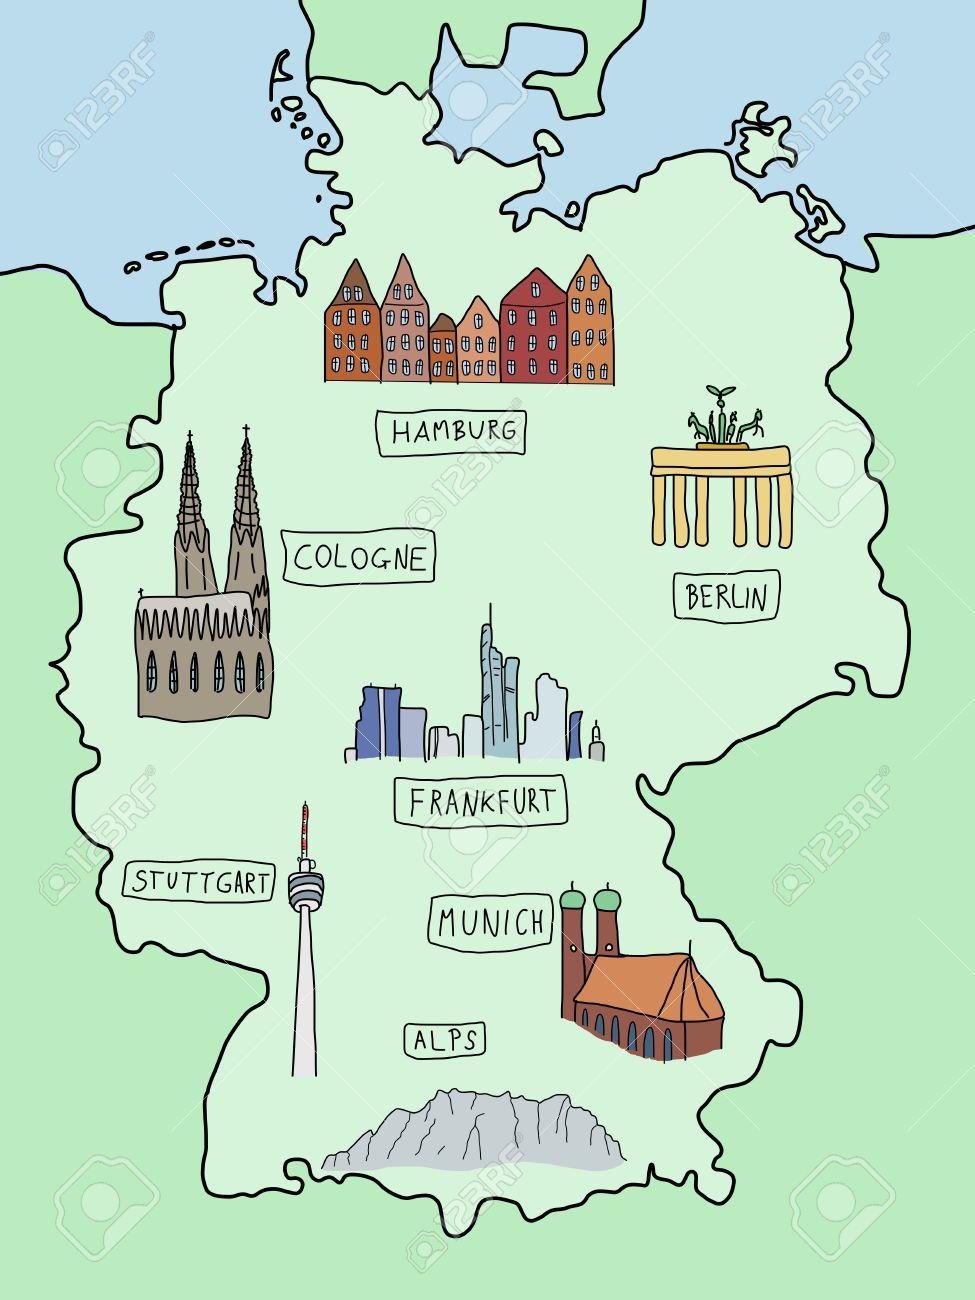 Hamburg Karte Sehenswurdigkeiten.Stock Photo